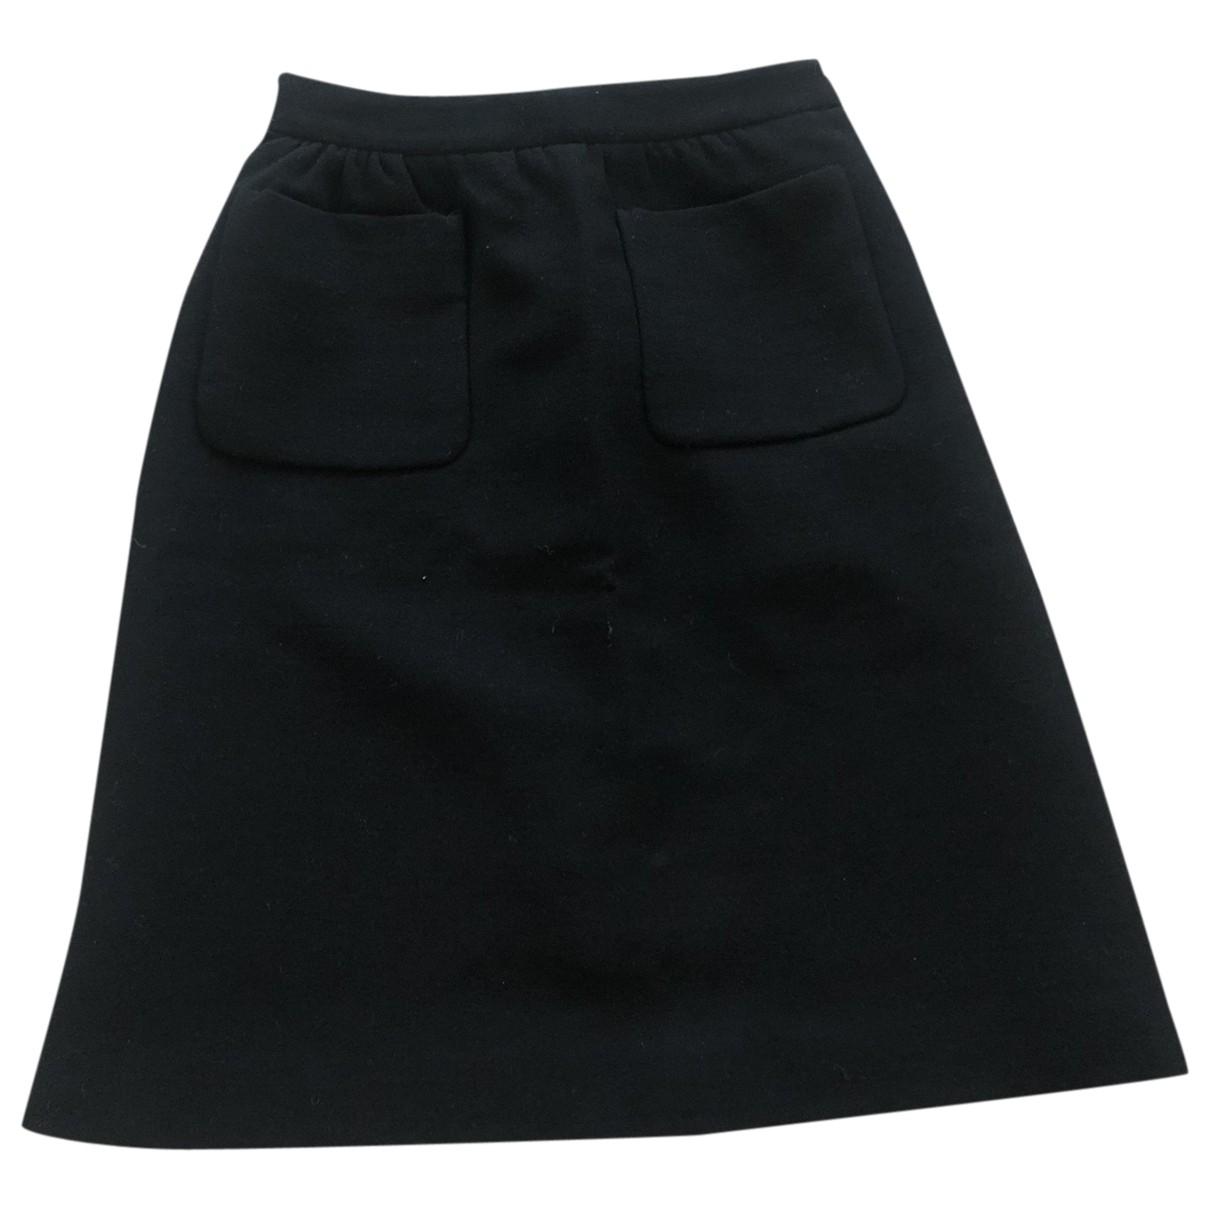 Miu Miu \N Black Wool skirt for Women 36 FR